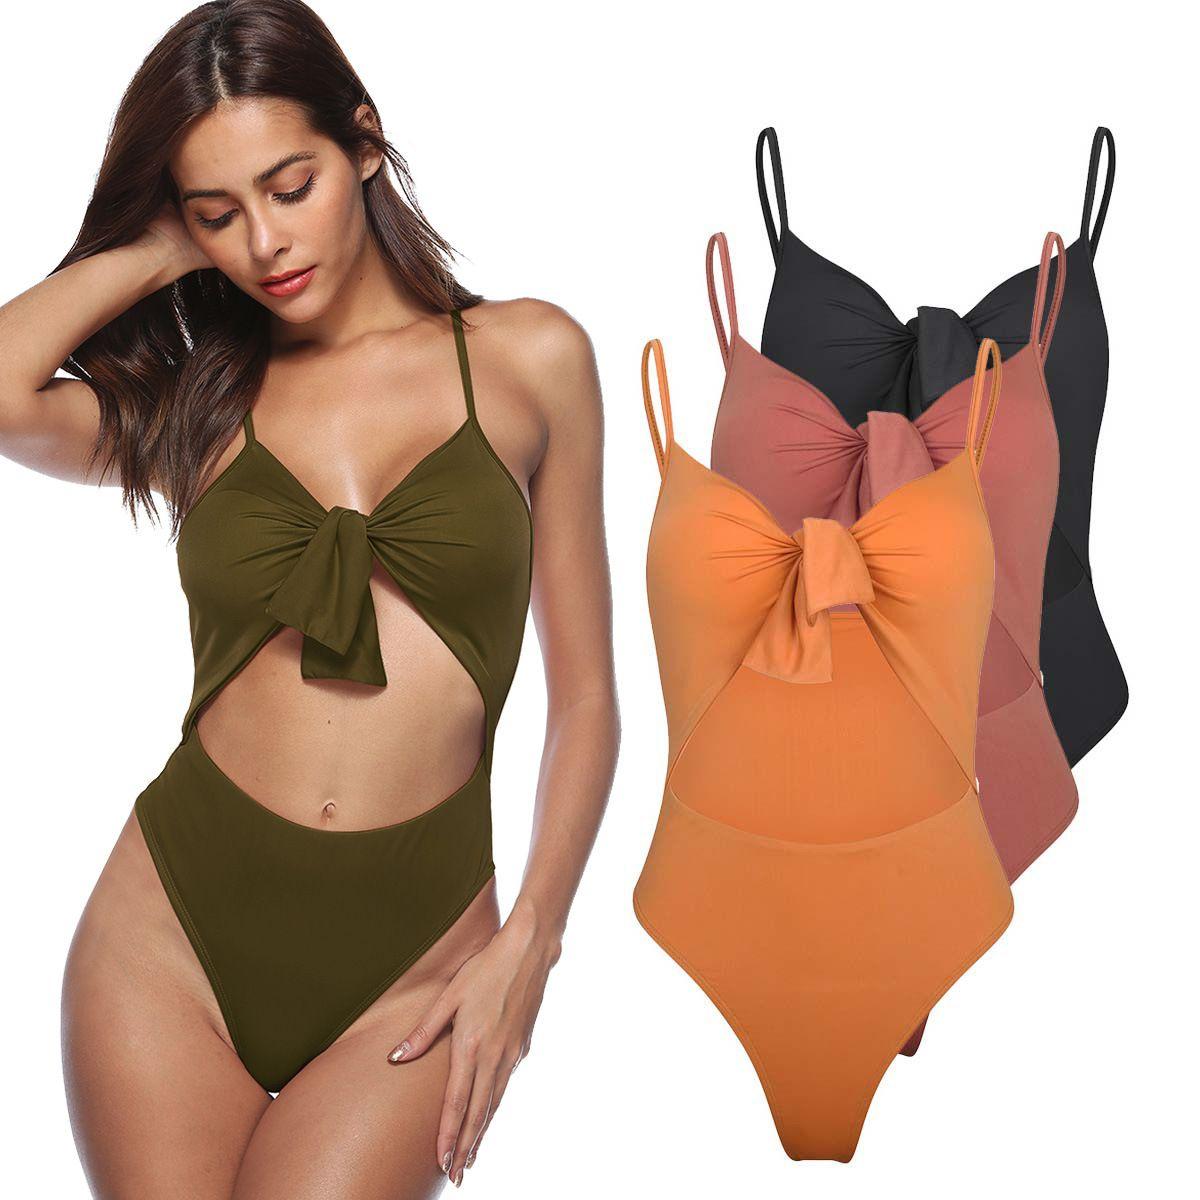 fd61372fb2 Biquini 2018 Vintage Striated Thong Bikini Set Strappy Bandage ...